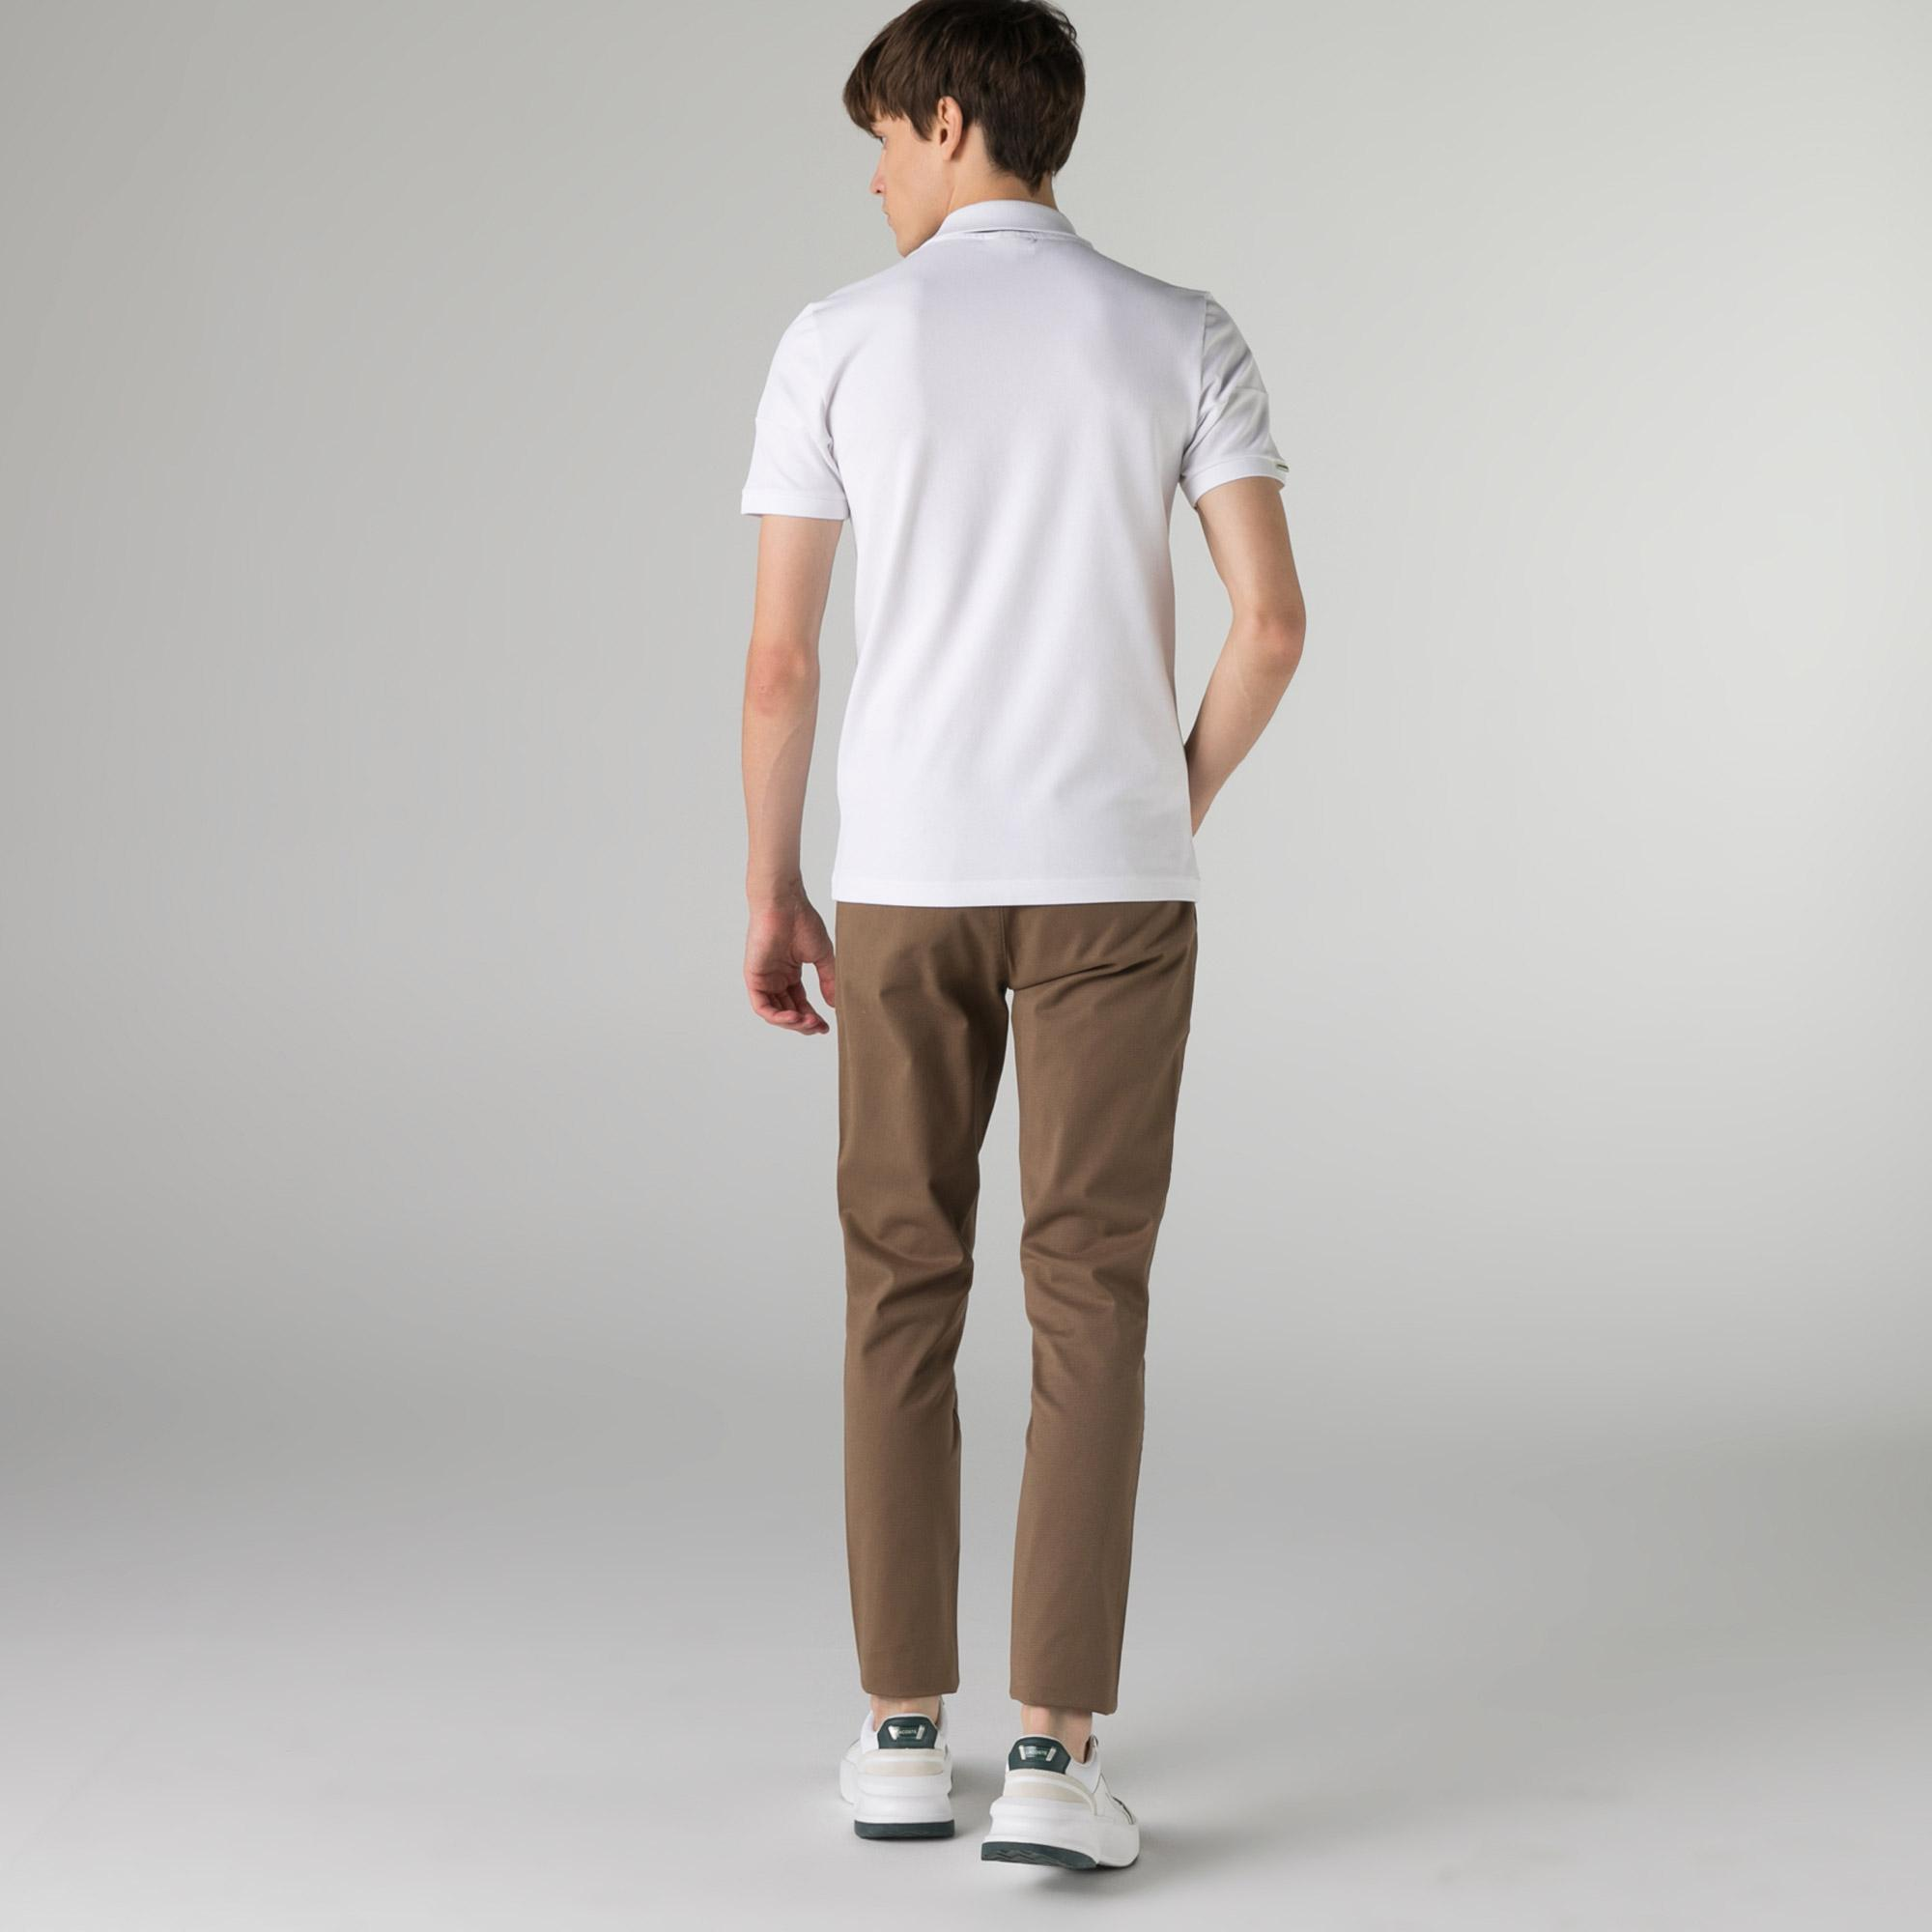 Lacoste Erkek Slim Fit Desenli Kahverengi Pantolon